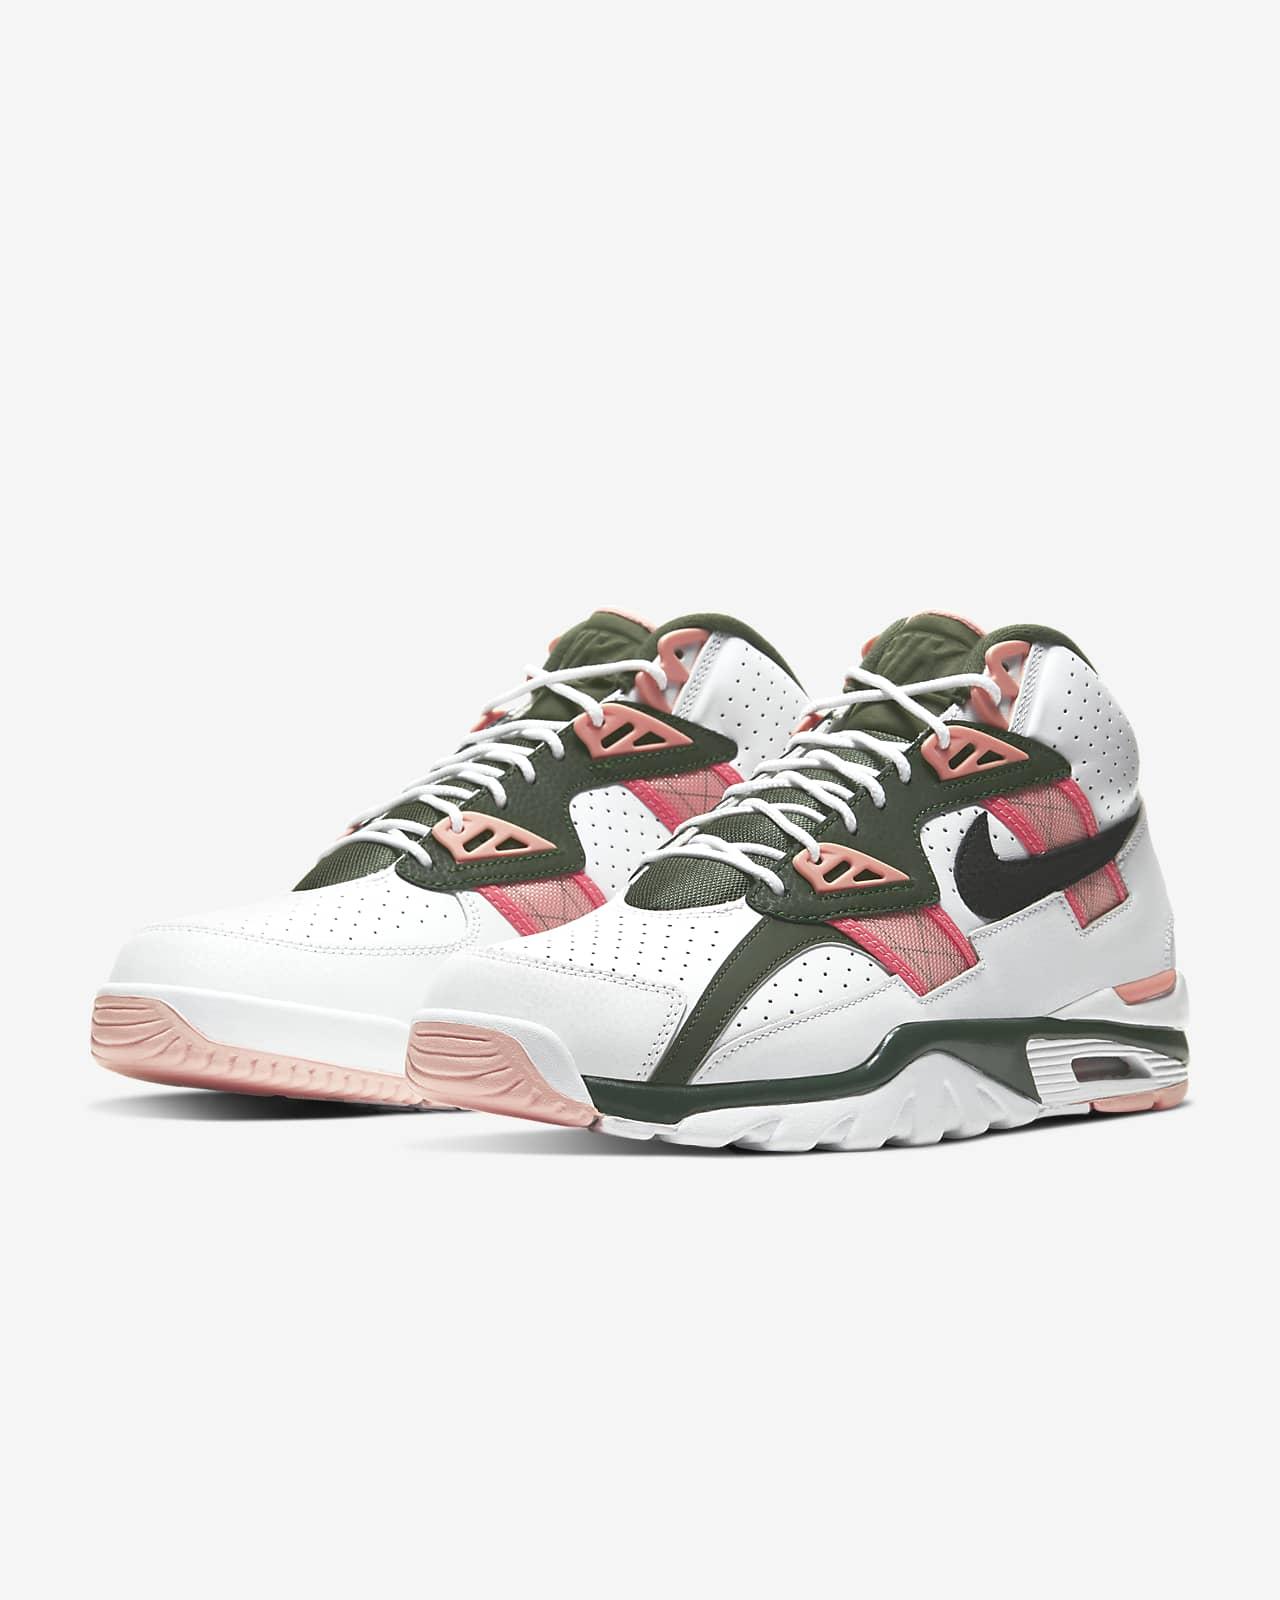 Nike Air Trainer SC High Men's Shoe